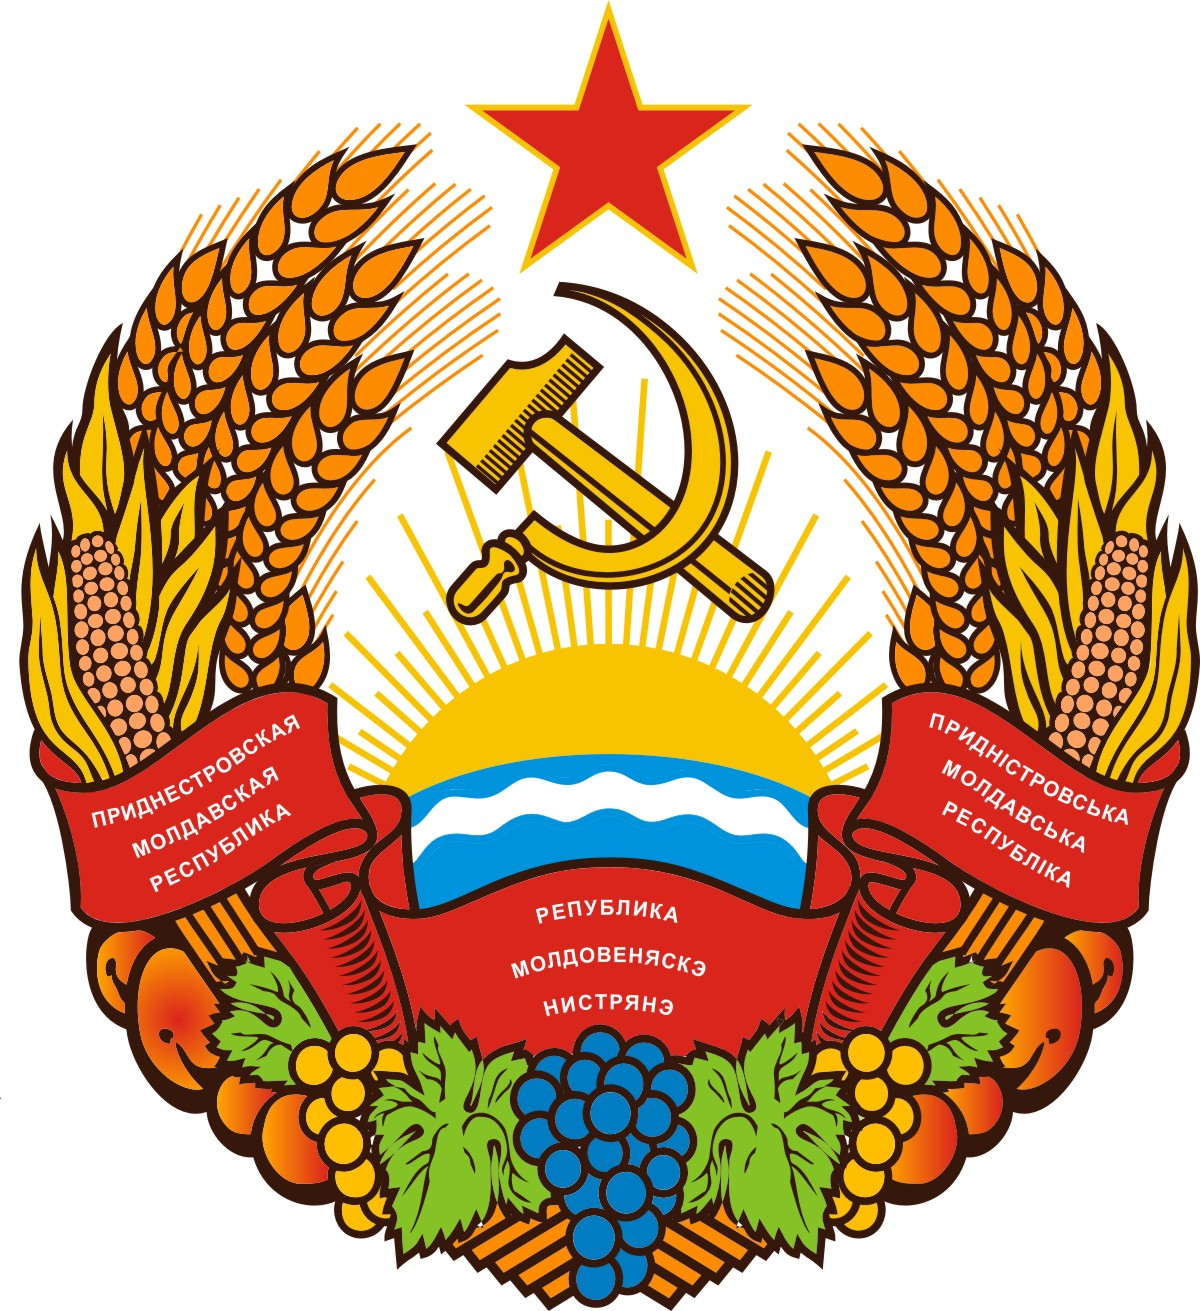 картинки герб молдавской сср нам